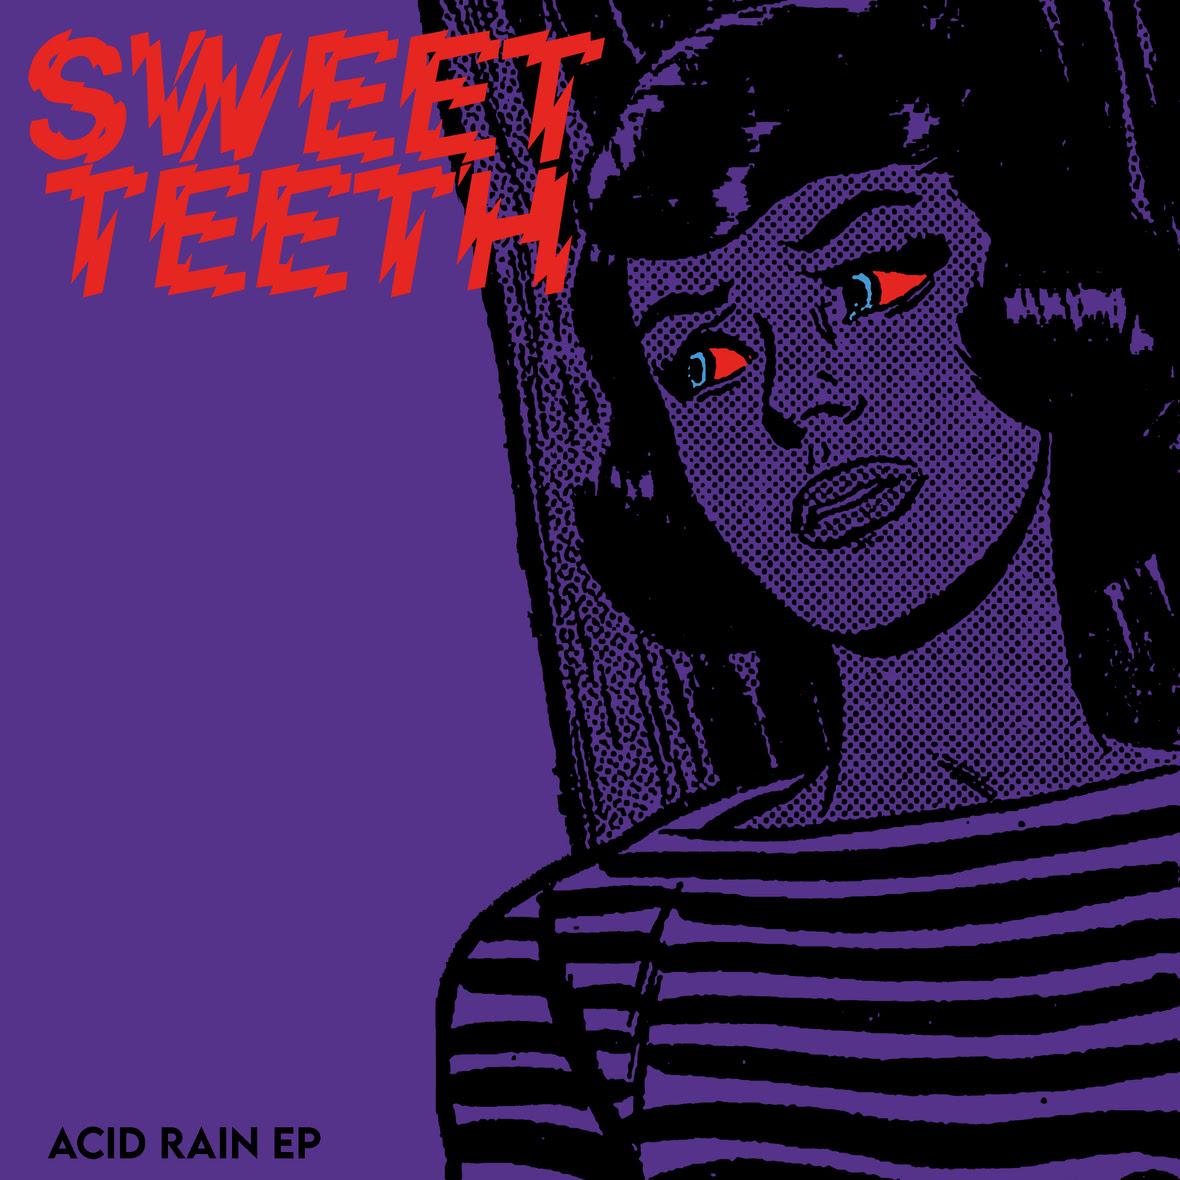 LLY048 - Sweet Teeth - Acid Rain - 3000X3000plixel 300dpi